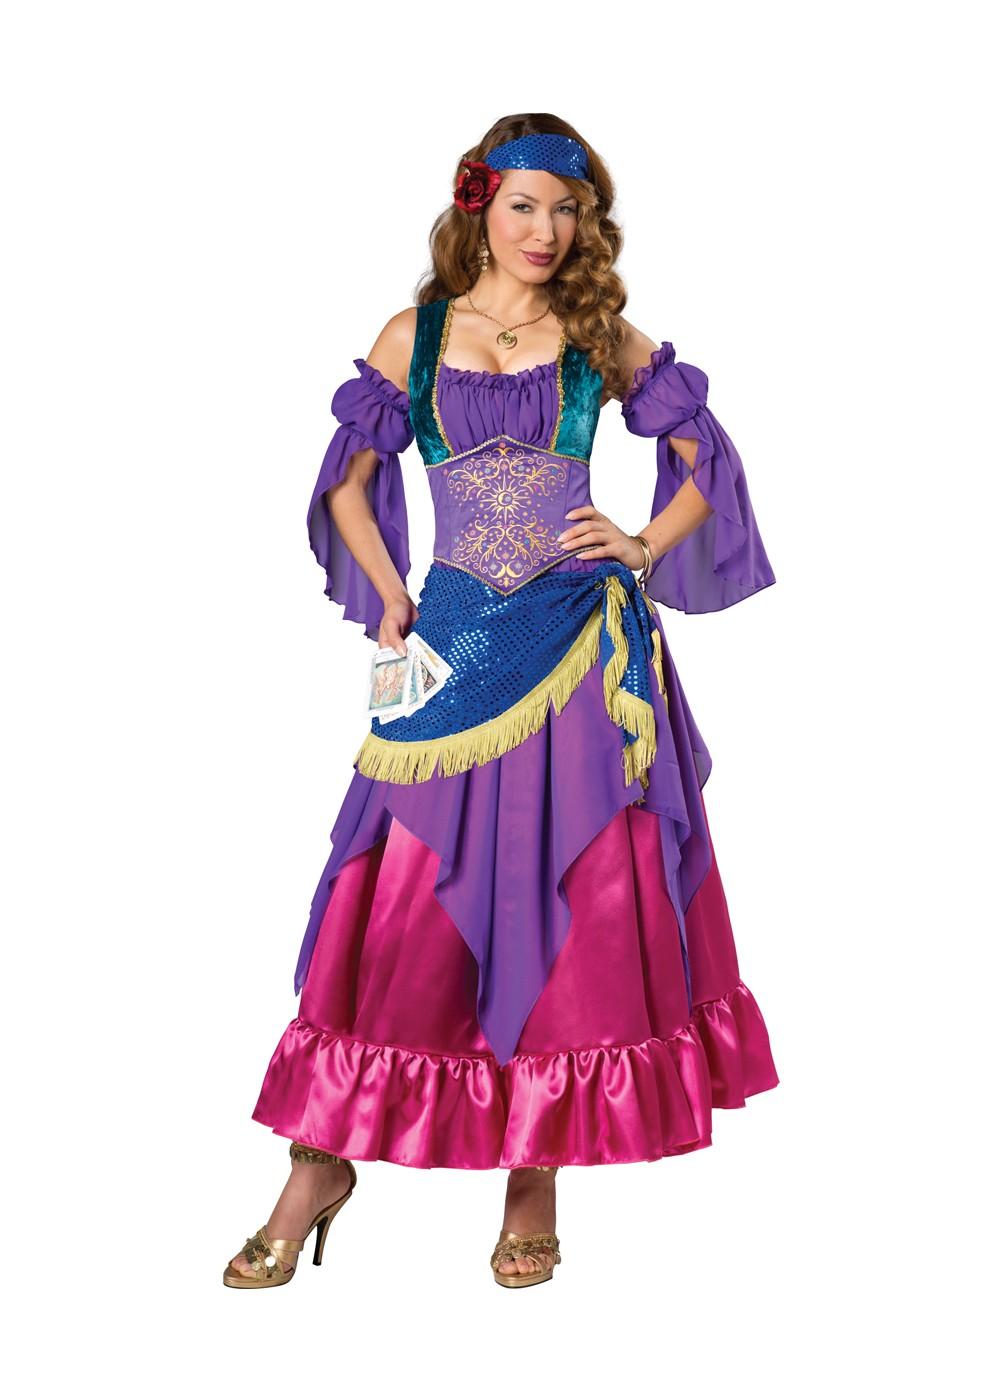 Gypsy Treasure Woman Costume - Renaissance Costumes-2576